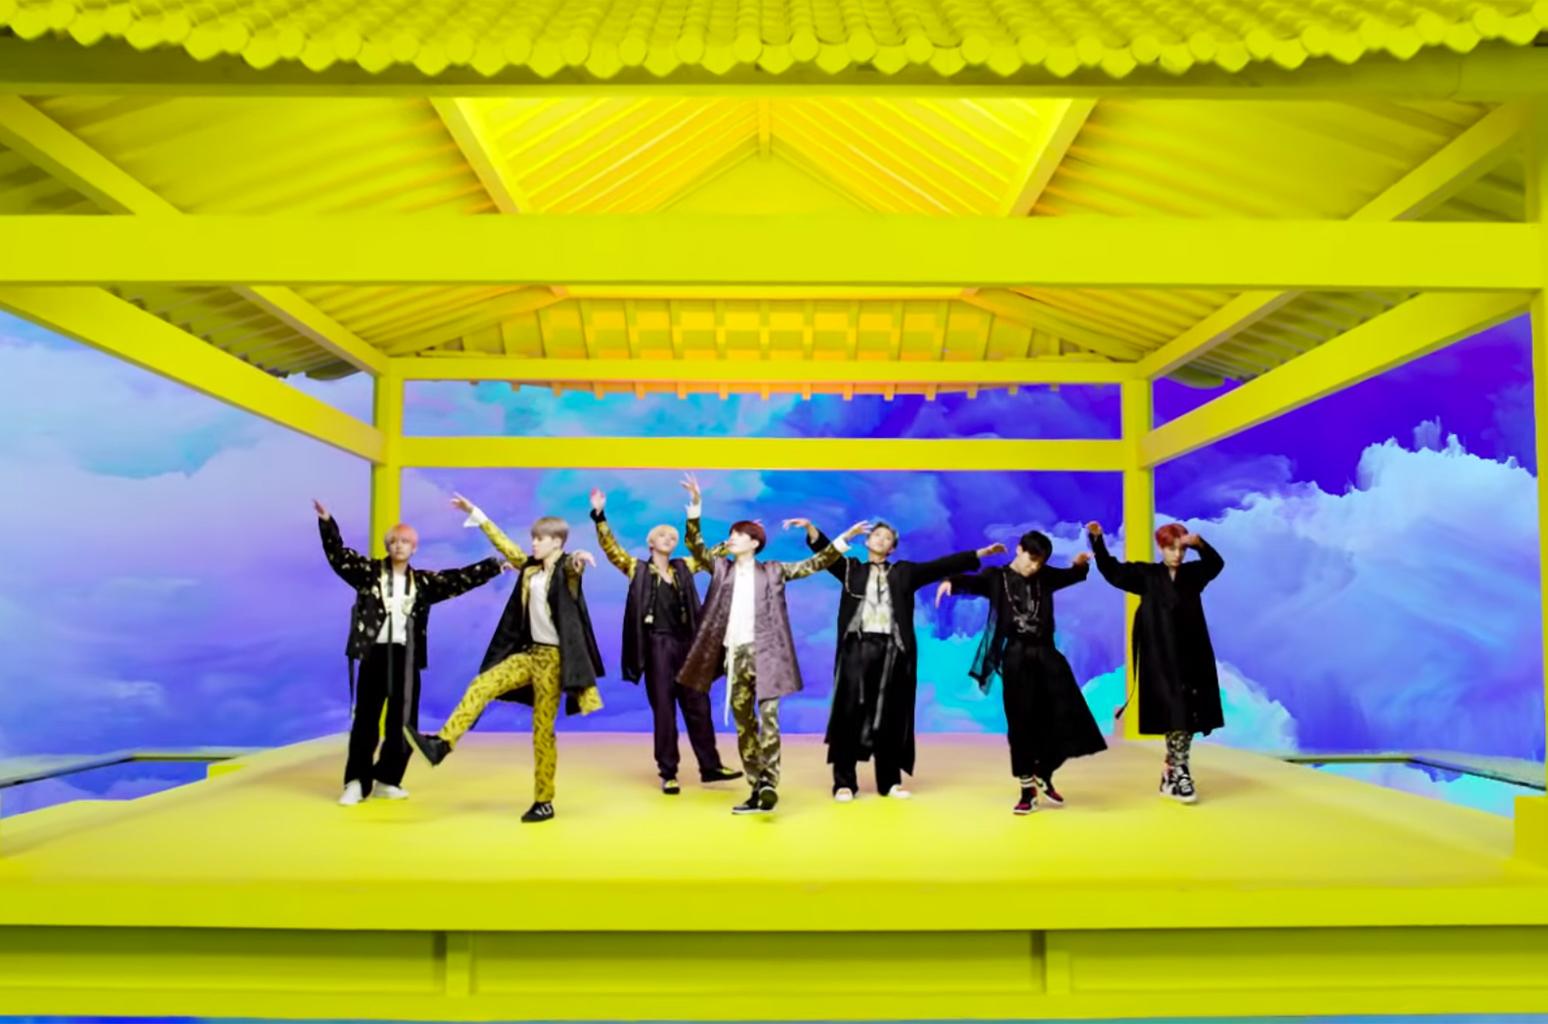 BTS' Idol Music Video hits 400 million views on youtube